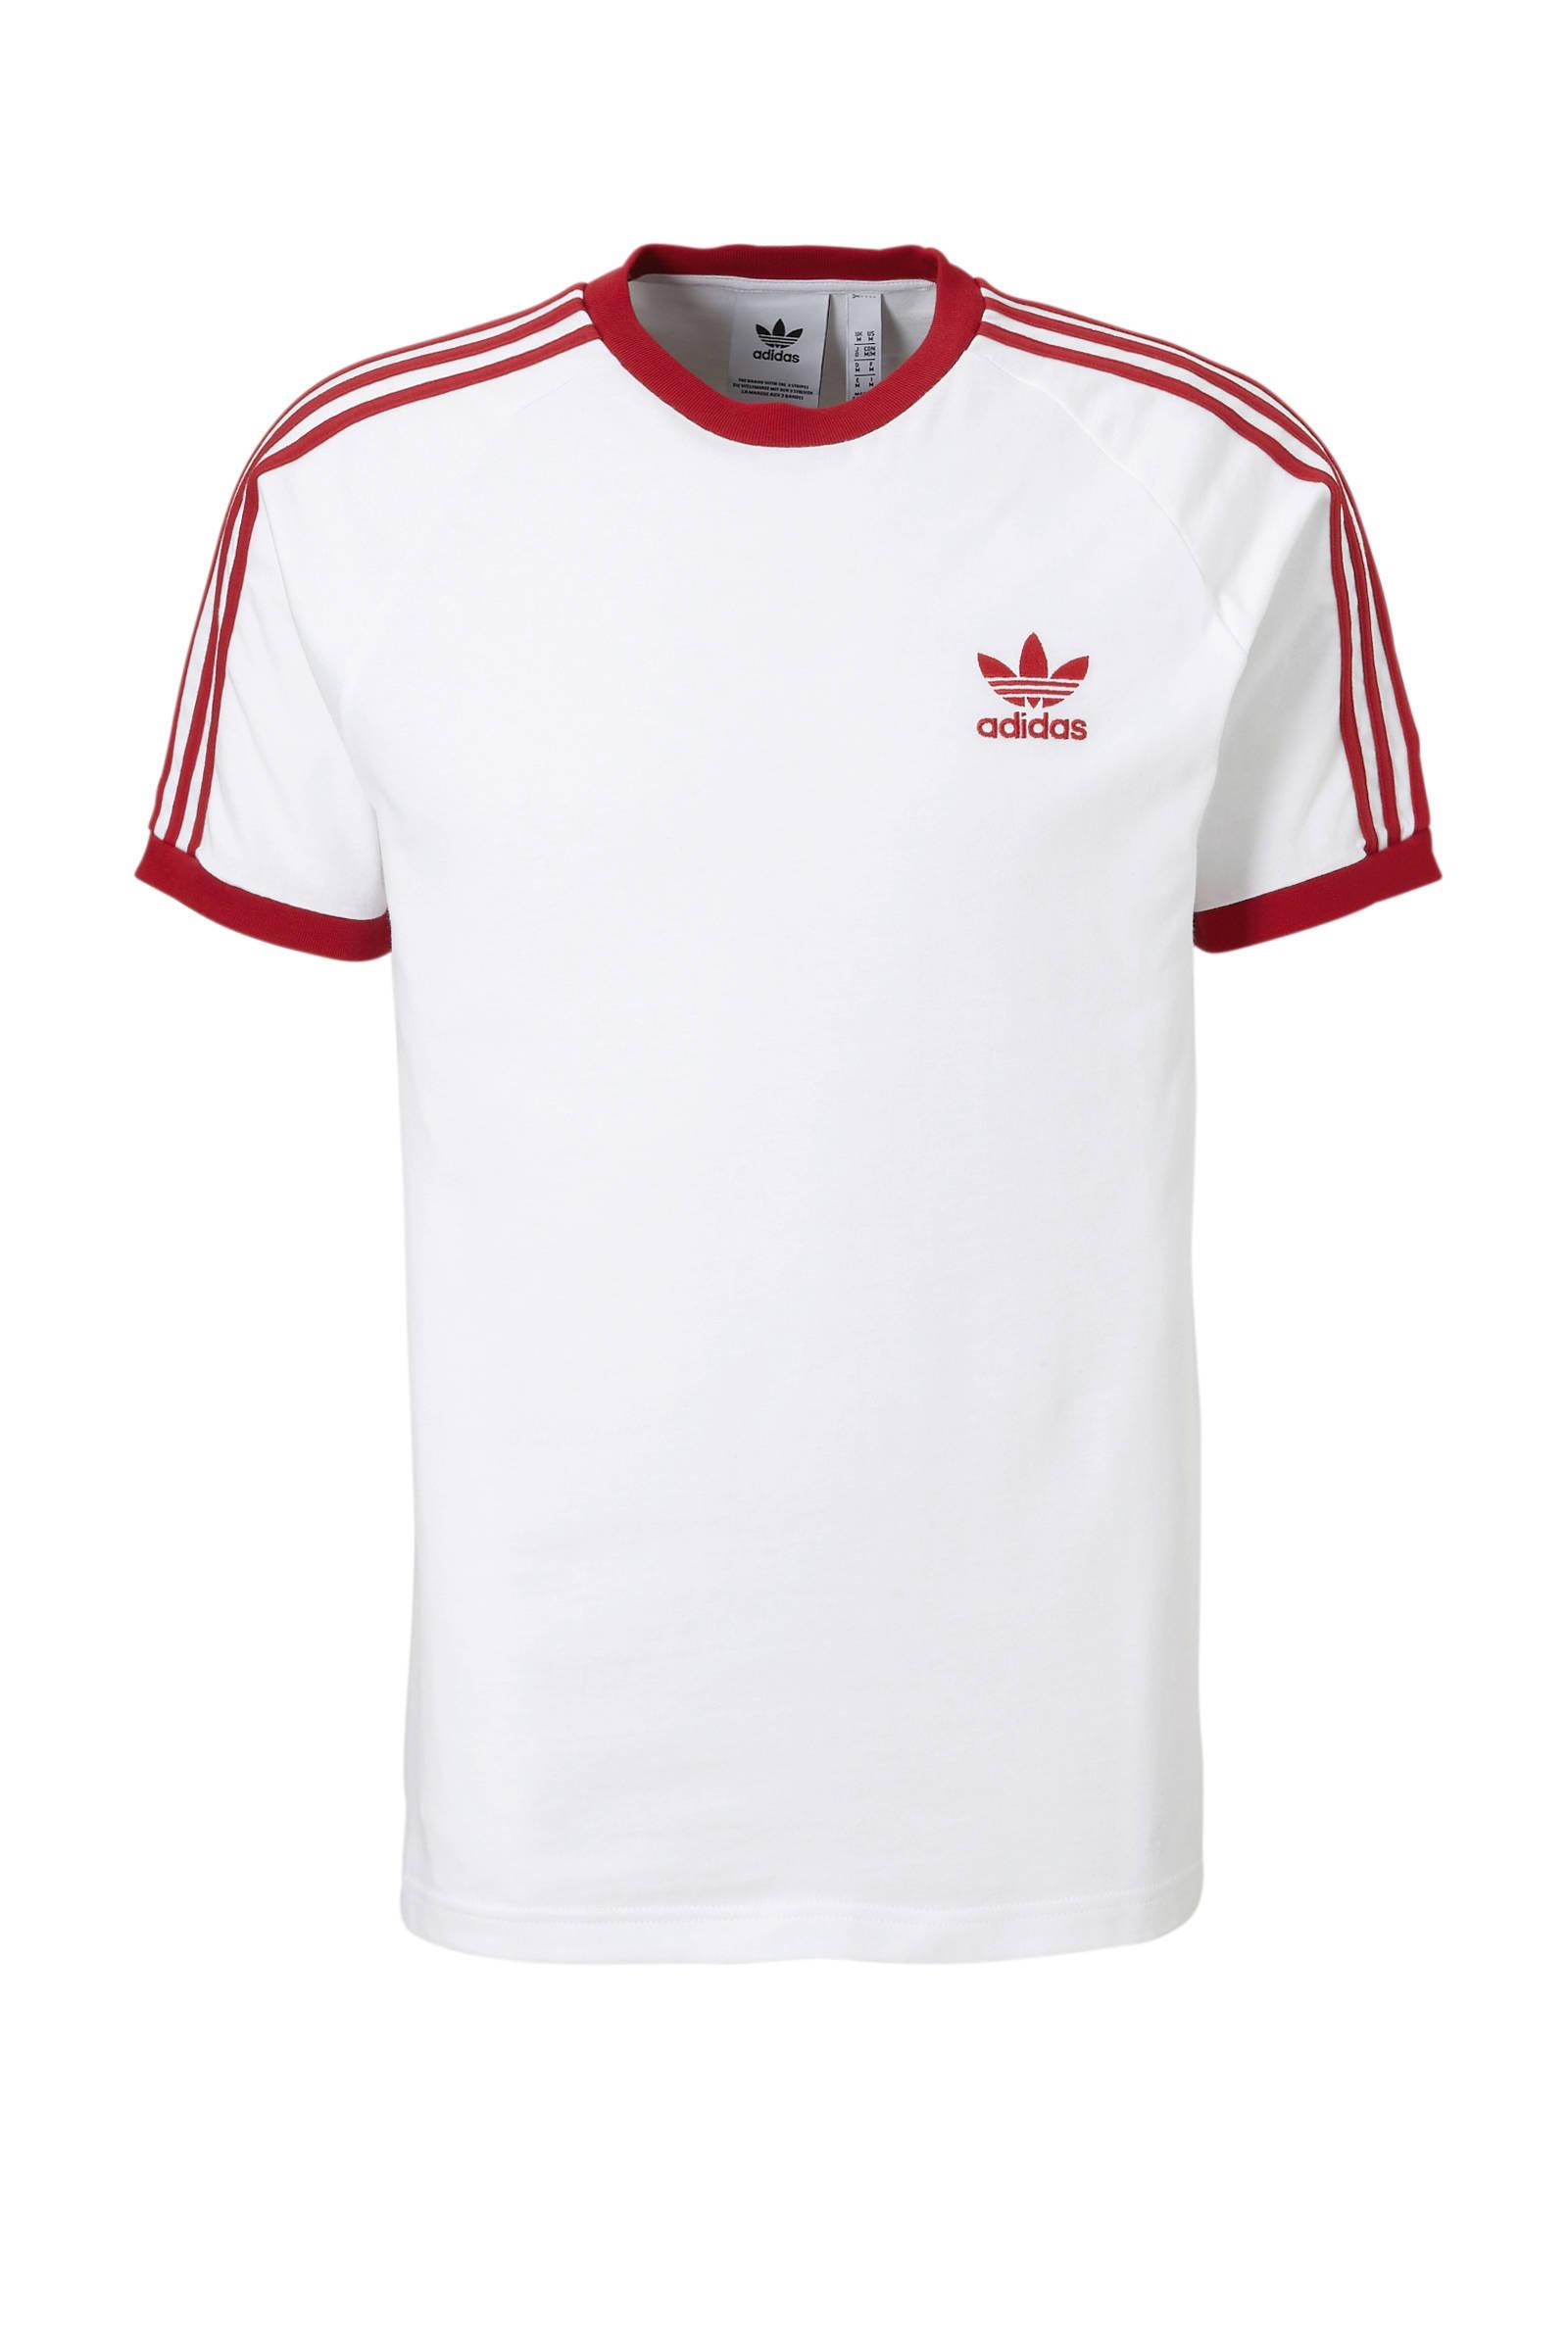 adidas Originals T shirt wit | wehkamp